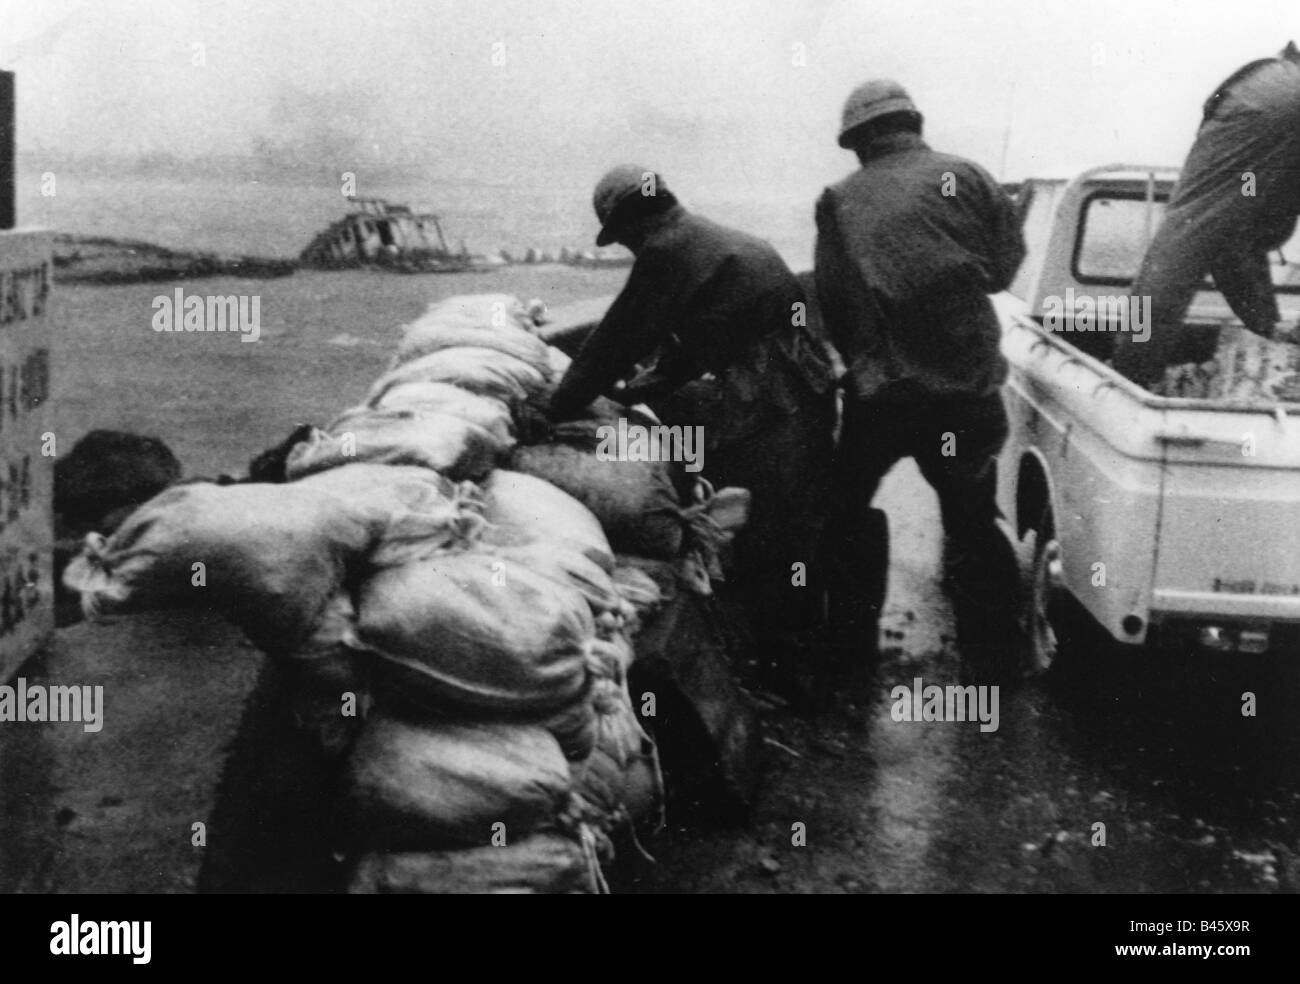 geography / travel, Japan, natural disasters, flood, rain typhoon trix, helper with sandbag, Kochi, 1.9.1971, Additional - Stock Image